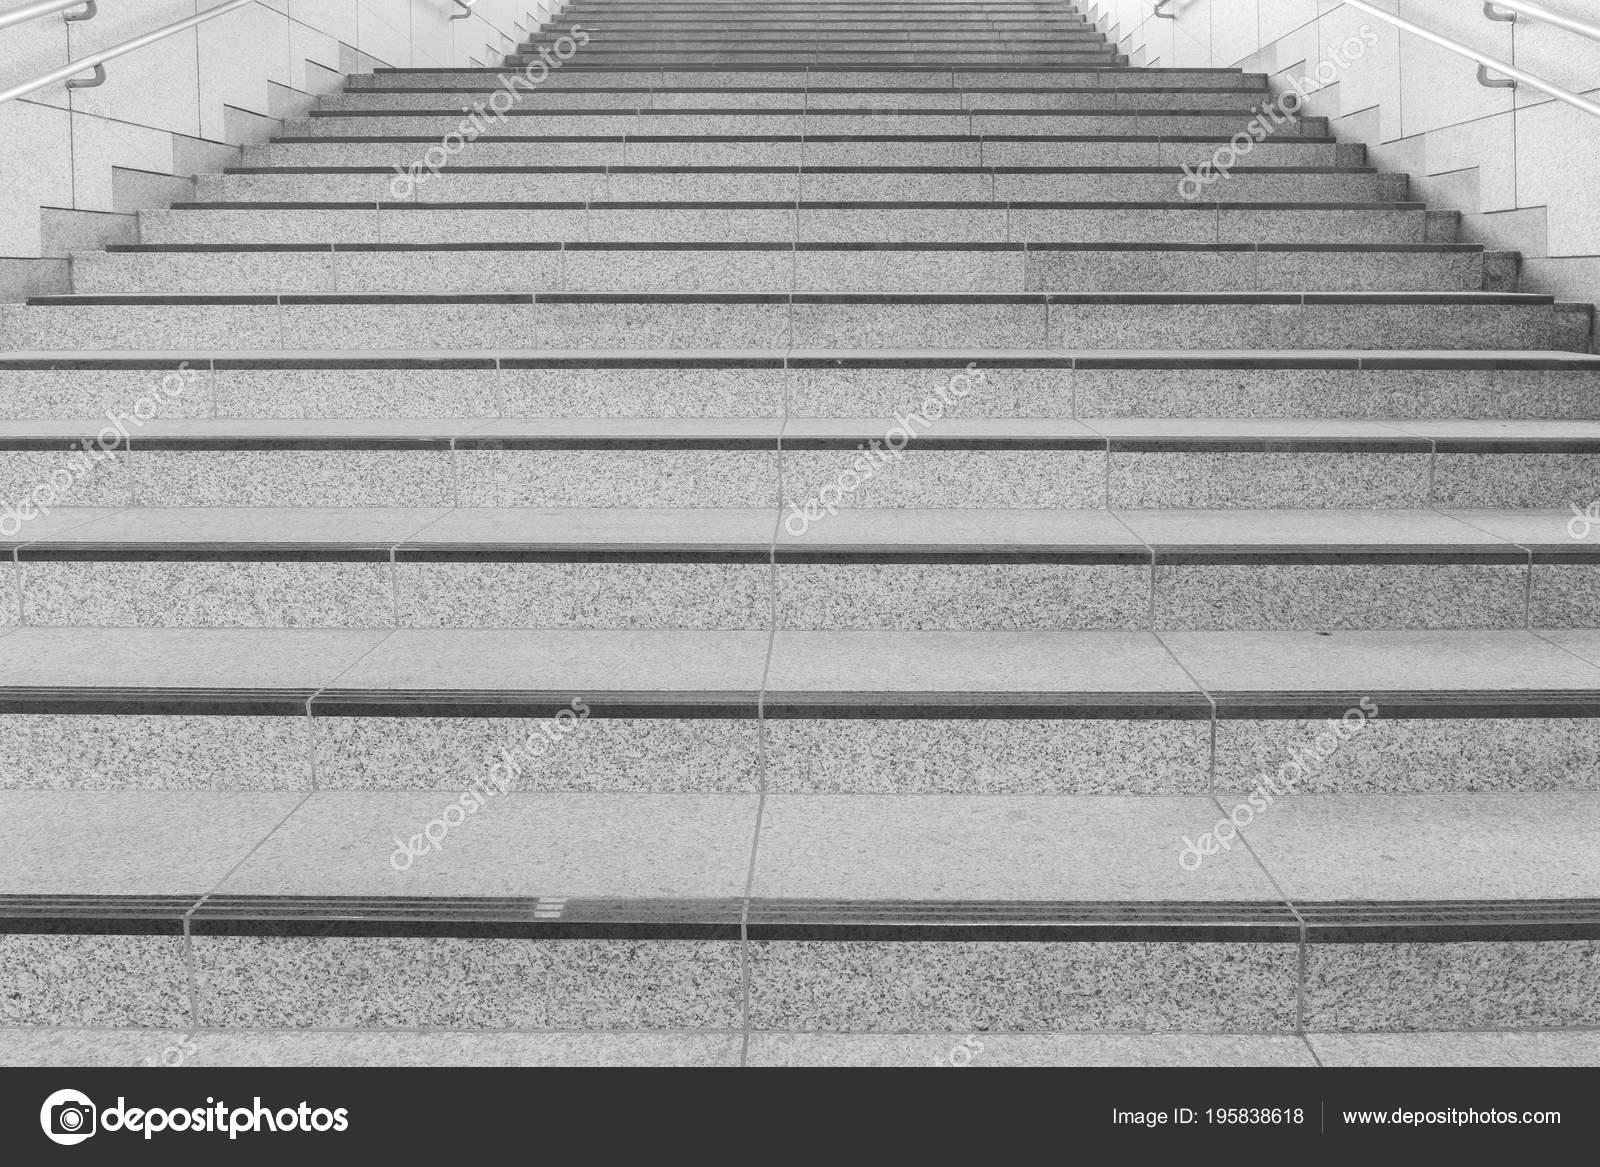 Betonnen trap met metalen leuning moderne buiding u2014 stockfoto